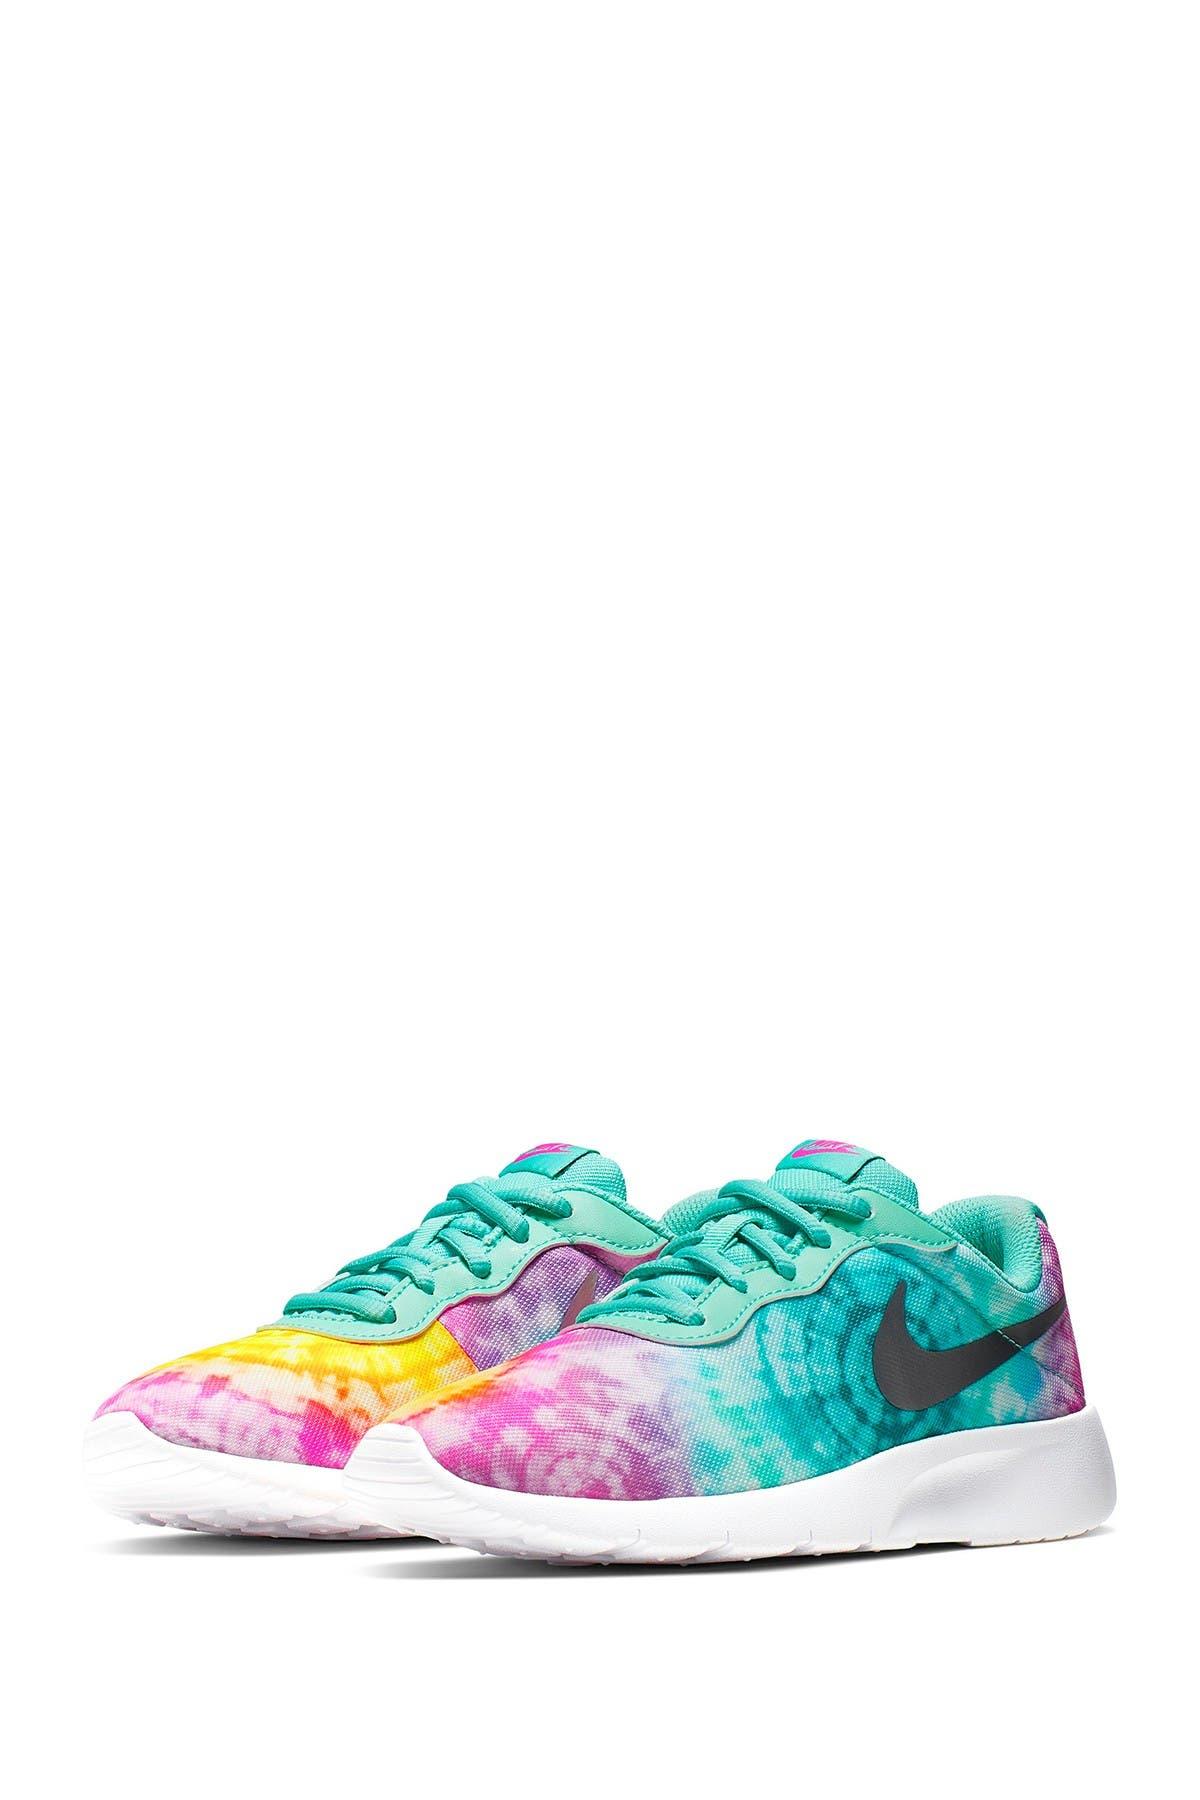 Nike   Tanjun Tie-Dye Shoe   Nordstrom Rack